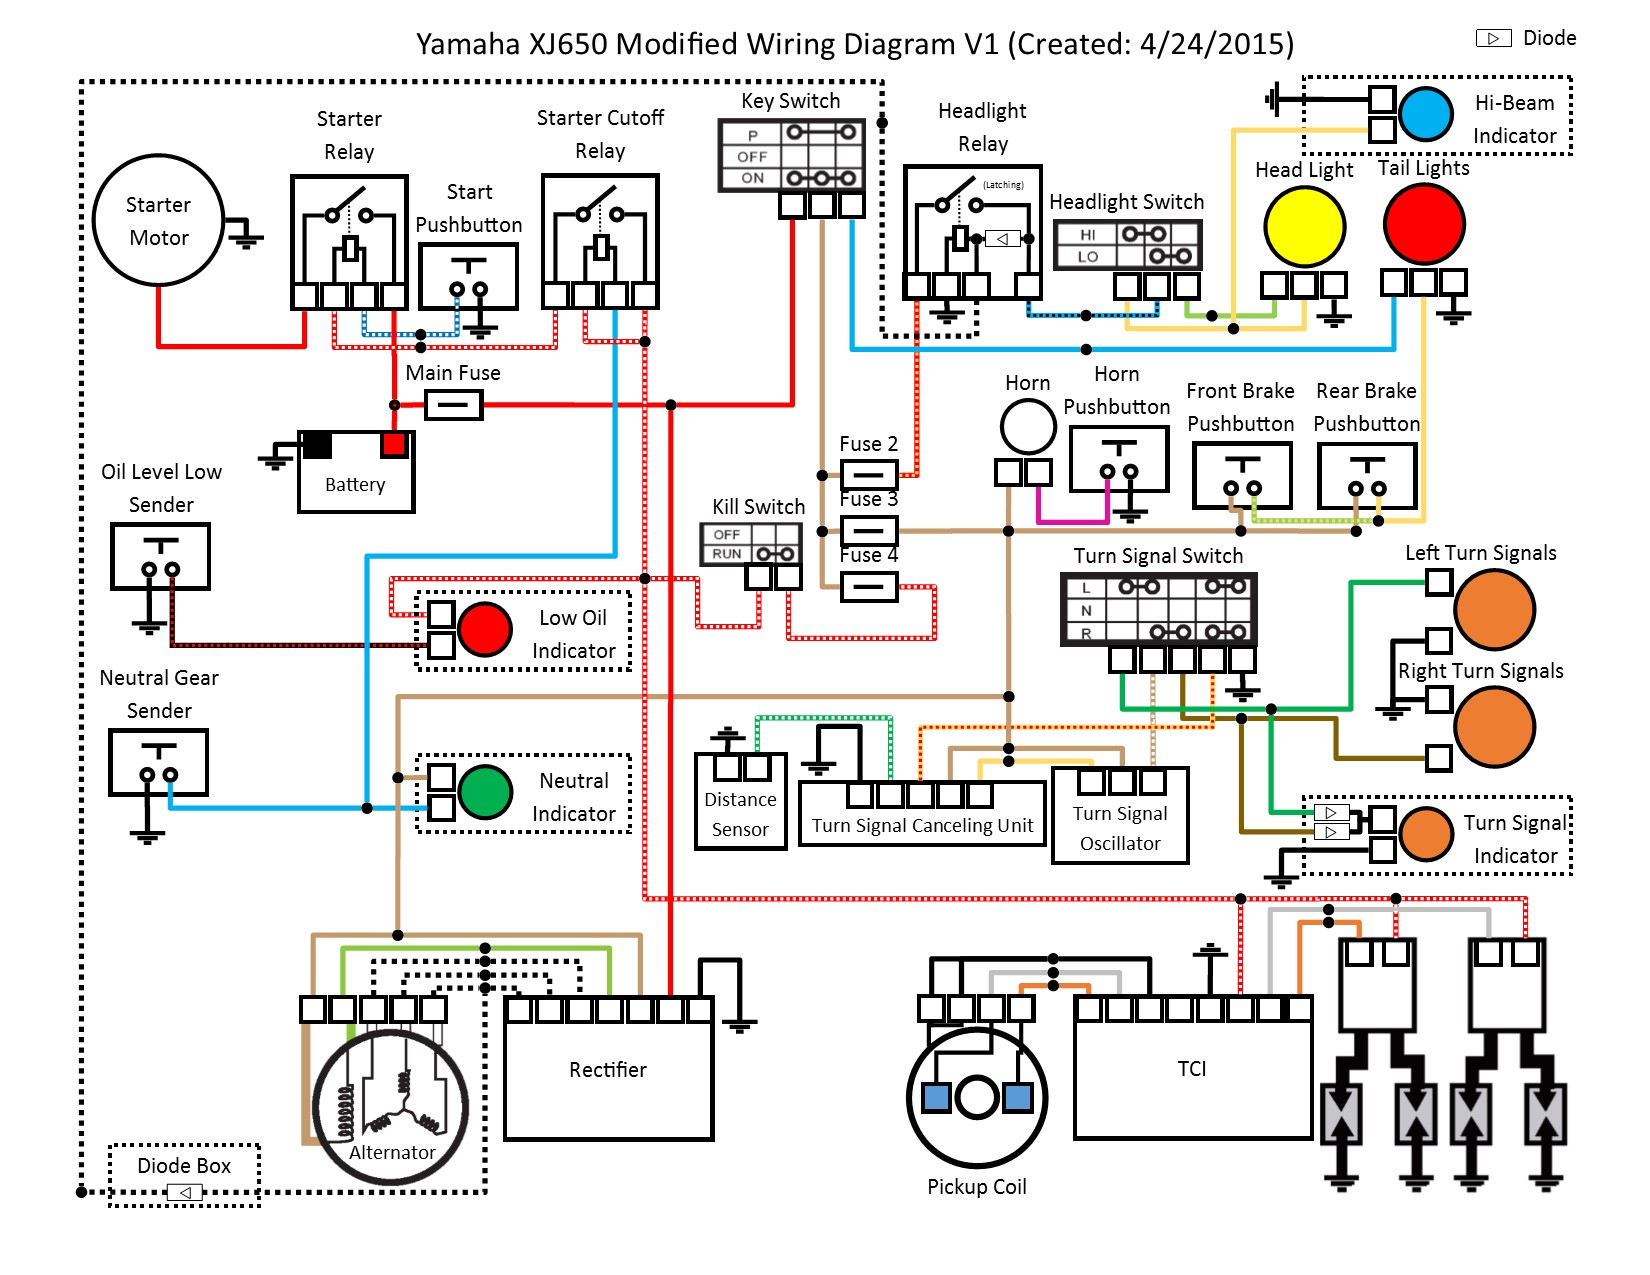 electrical wiring diagram software free download wirings diagram